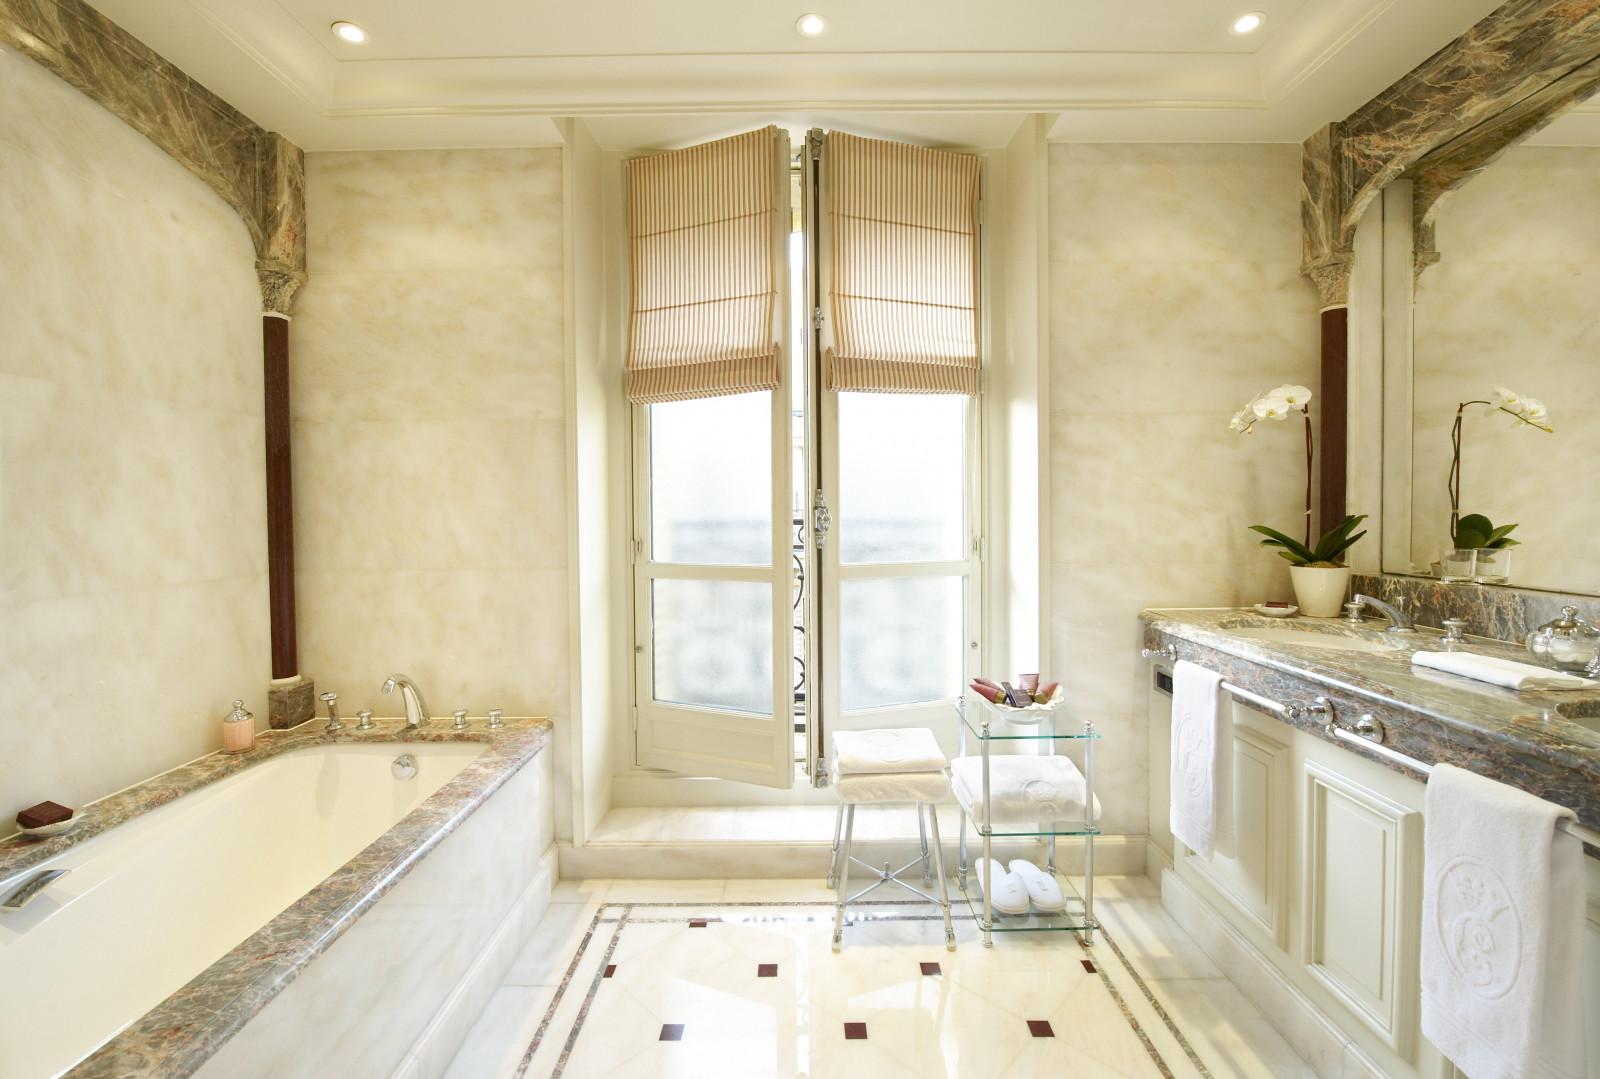 Windows White Paris France Bathroom Design Interior Palace Clean Bathtub Ious Marble Elegant Decor Majestic Luxury